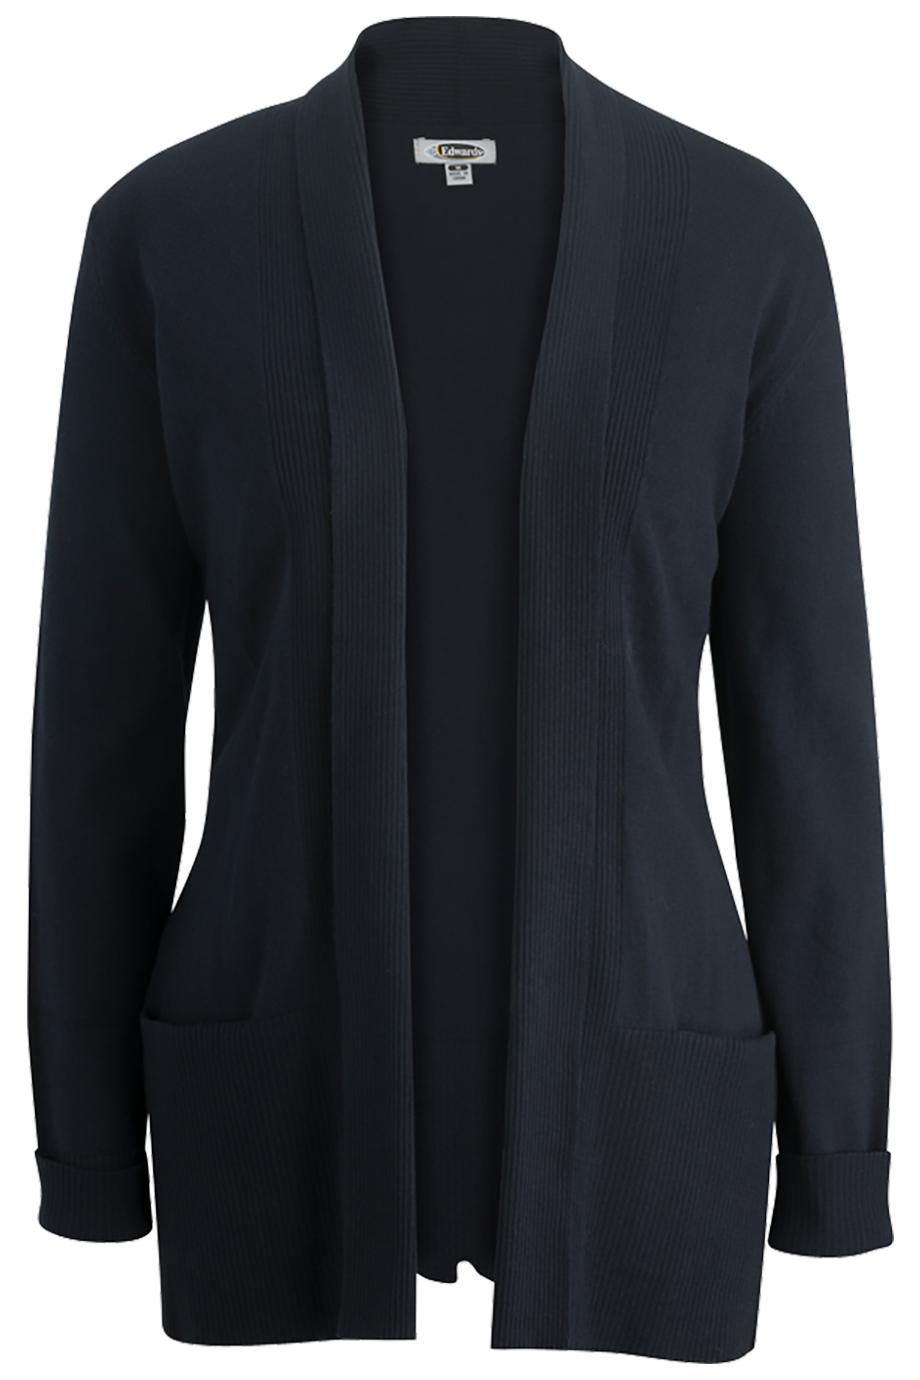 Buy Edwards Ladies Shawl Collar Cardigan Sweater - Edwards Online at ... 9a68609ea